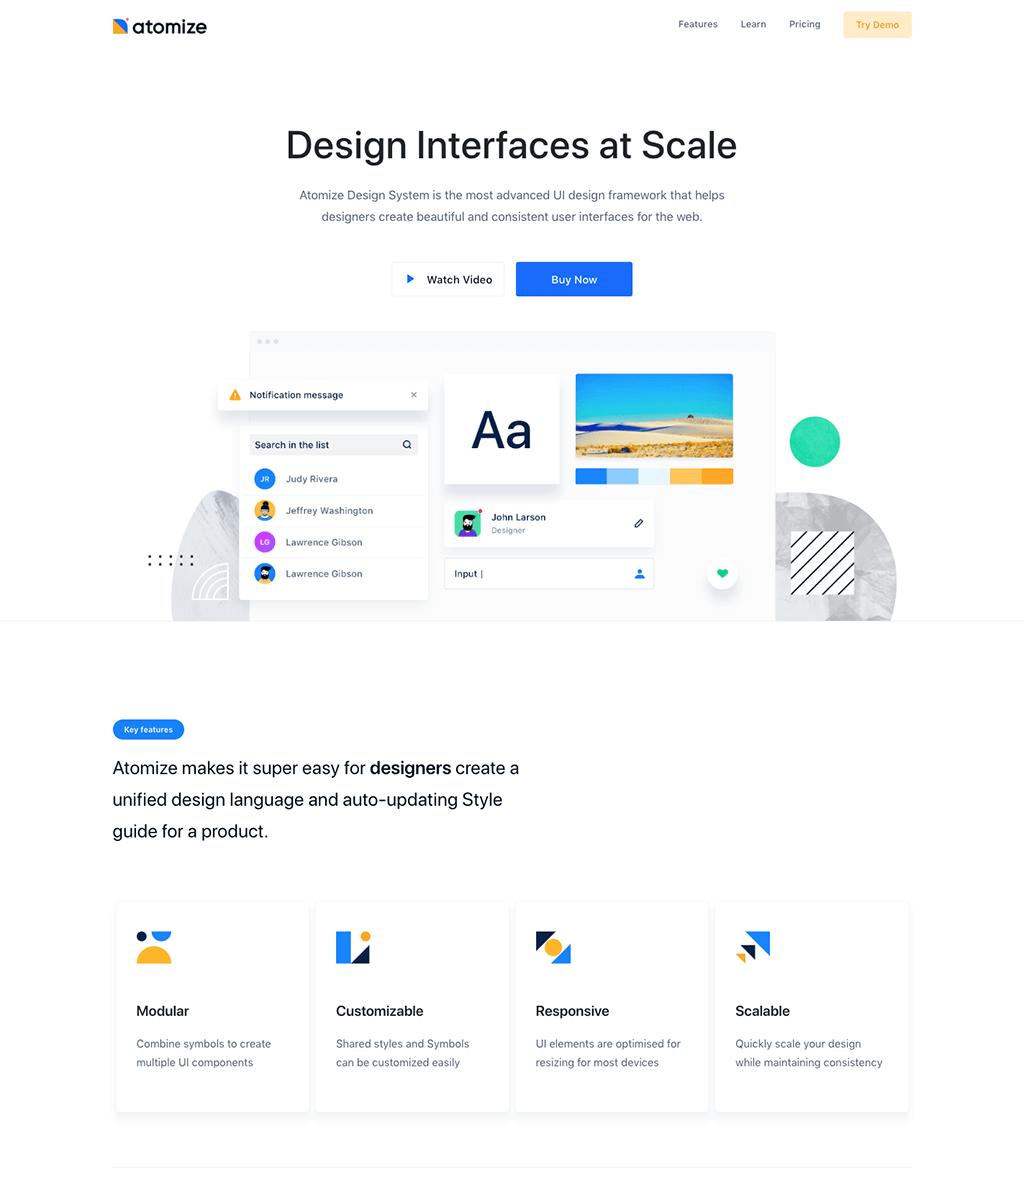 Atomize Design Card Styles